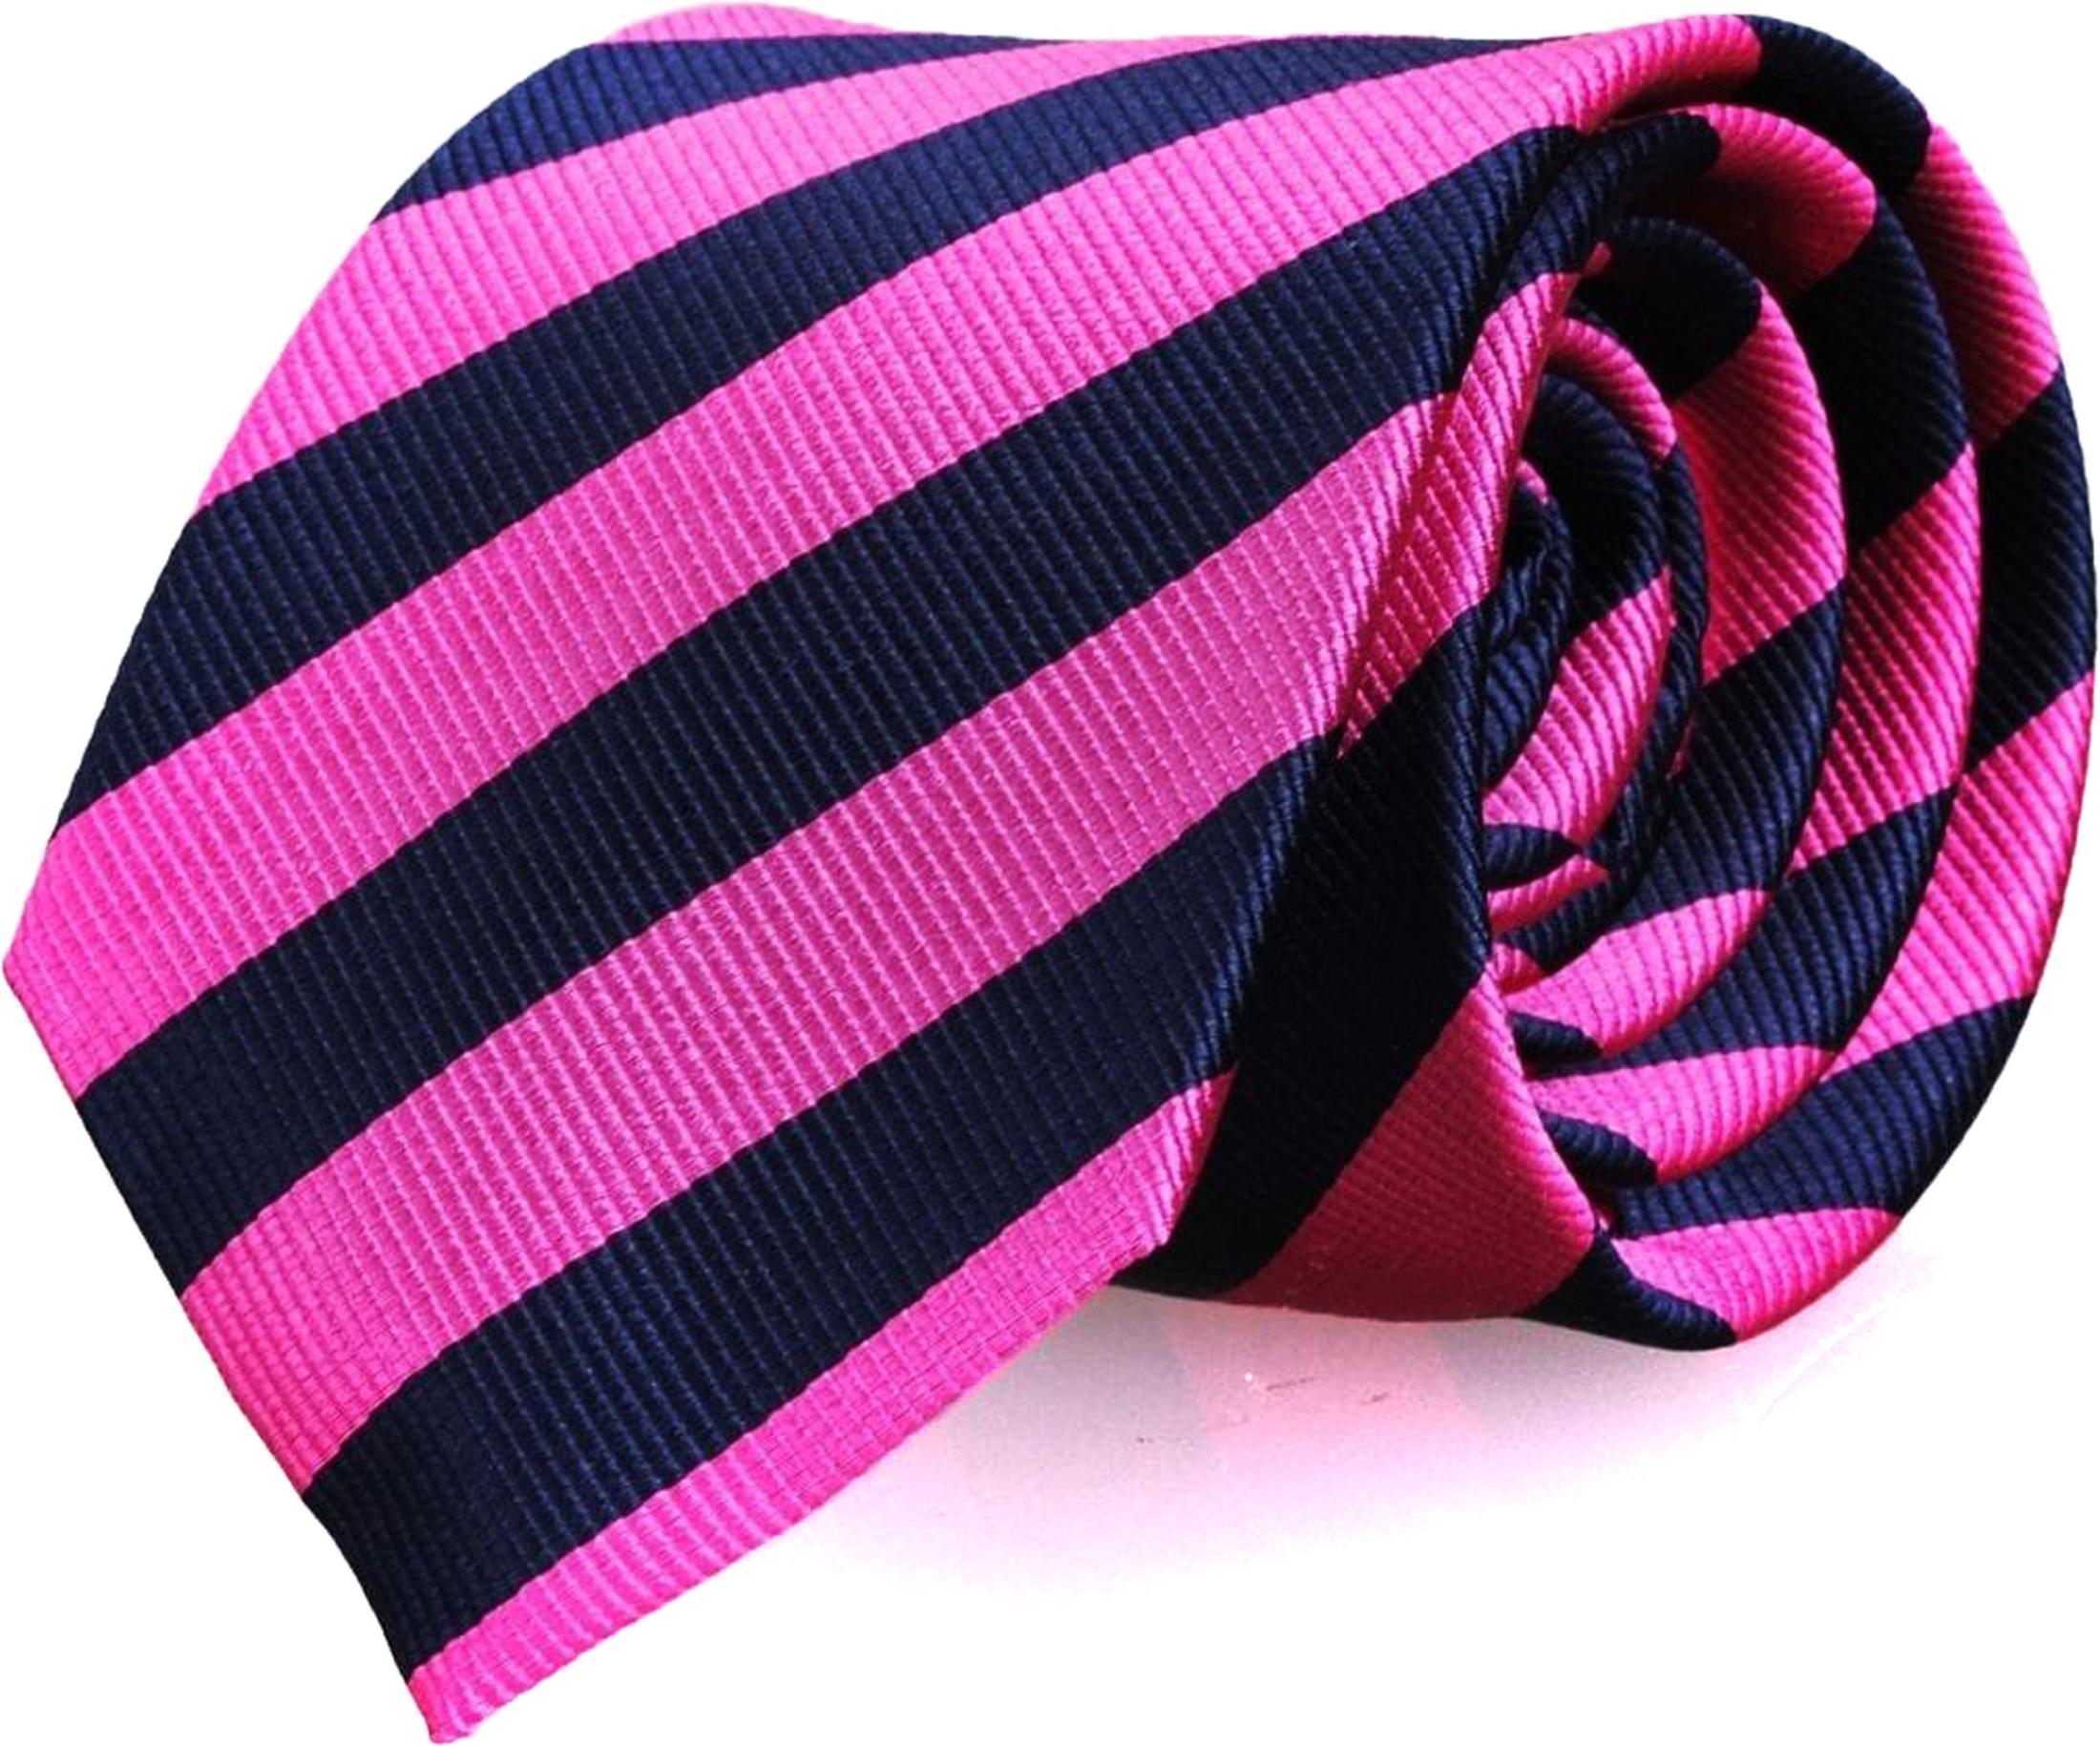 Krawatte Seide Fuchsia - Navy Streep FD10